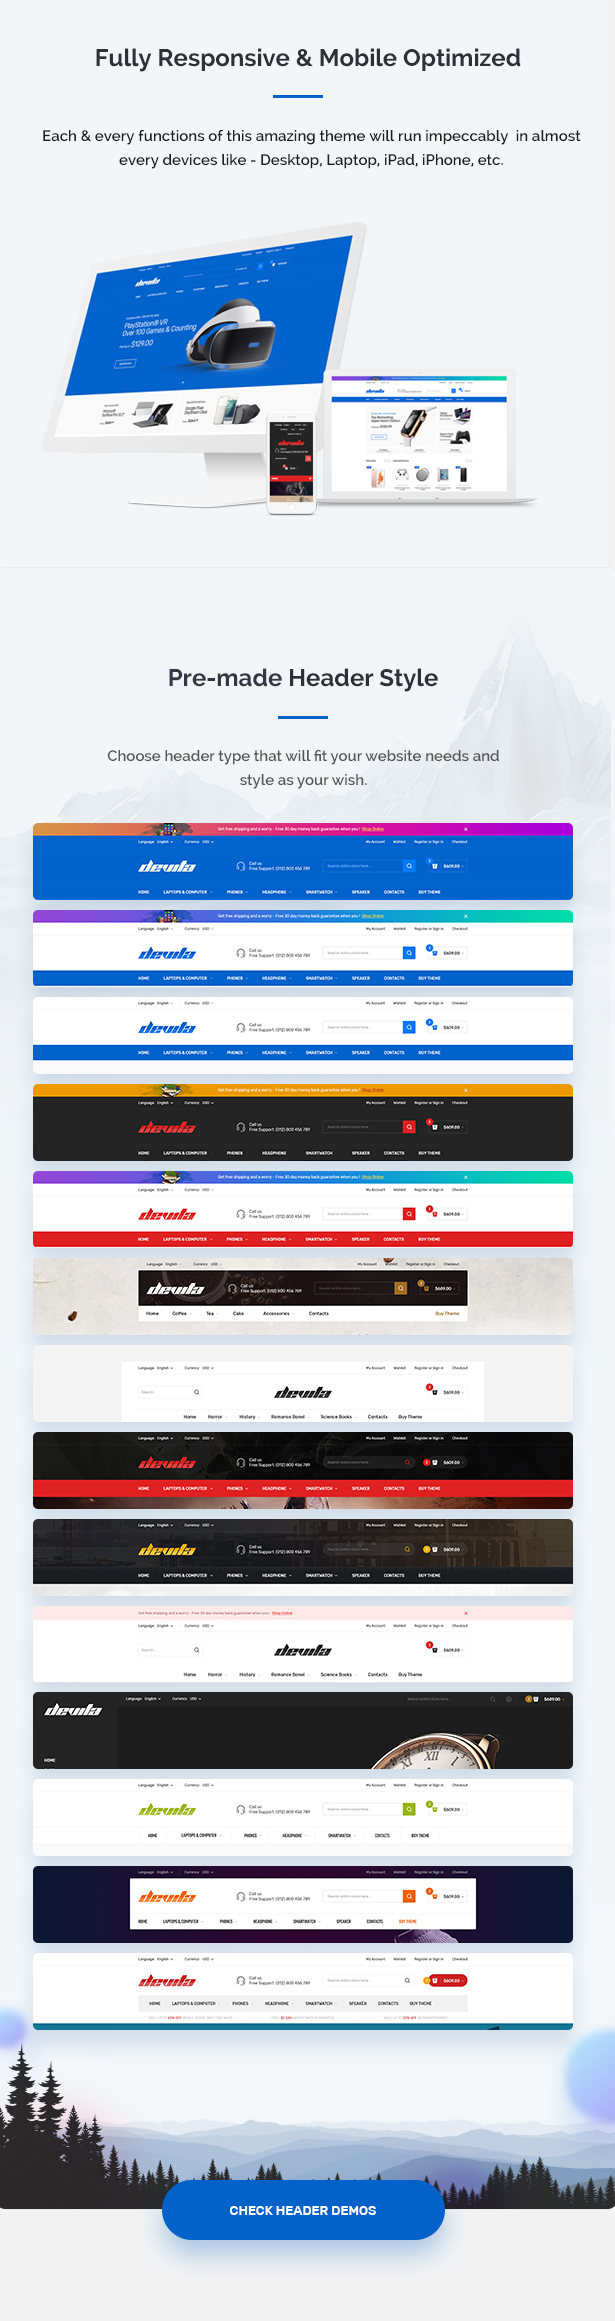 Devita - eCommerce Shopify Theme - 6